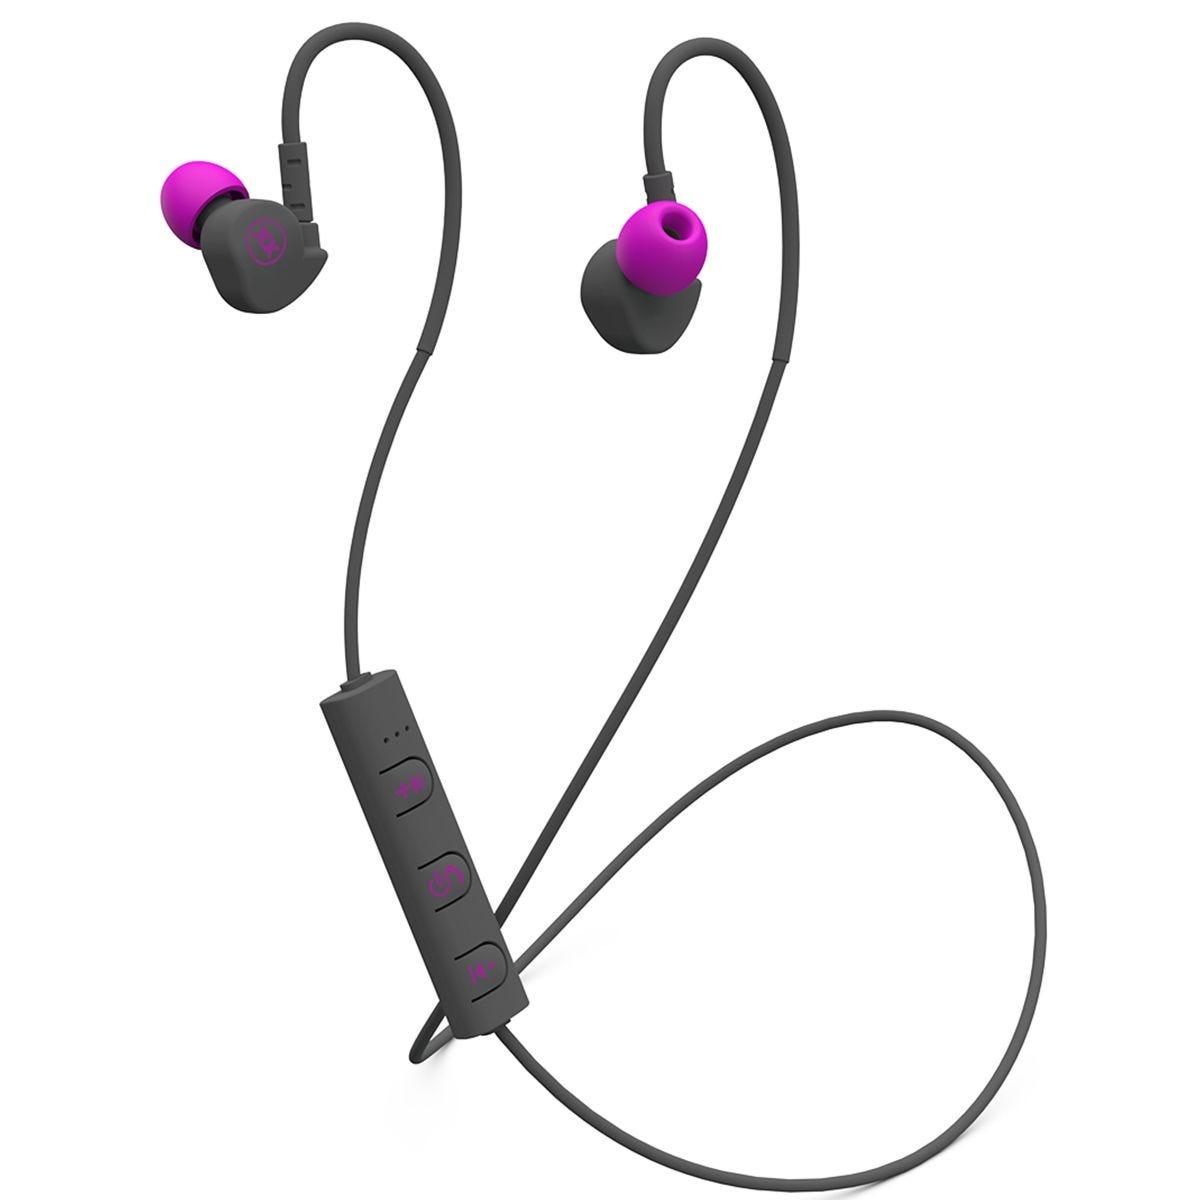 Mixx Memory Fit Wireless Sport Earphones - Grey/Pink